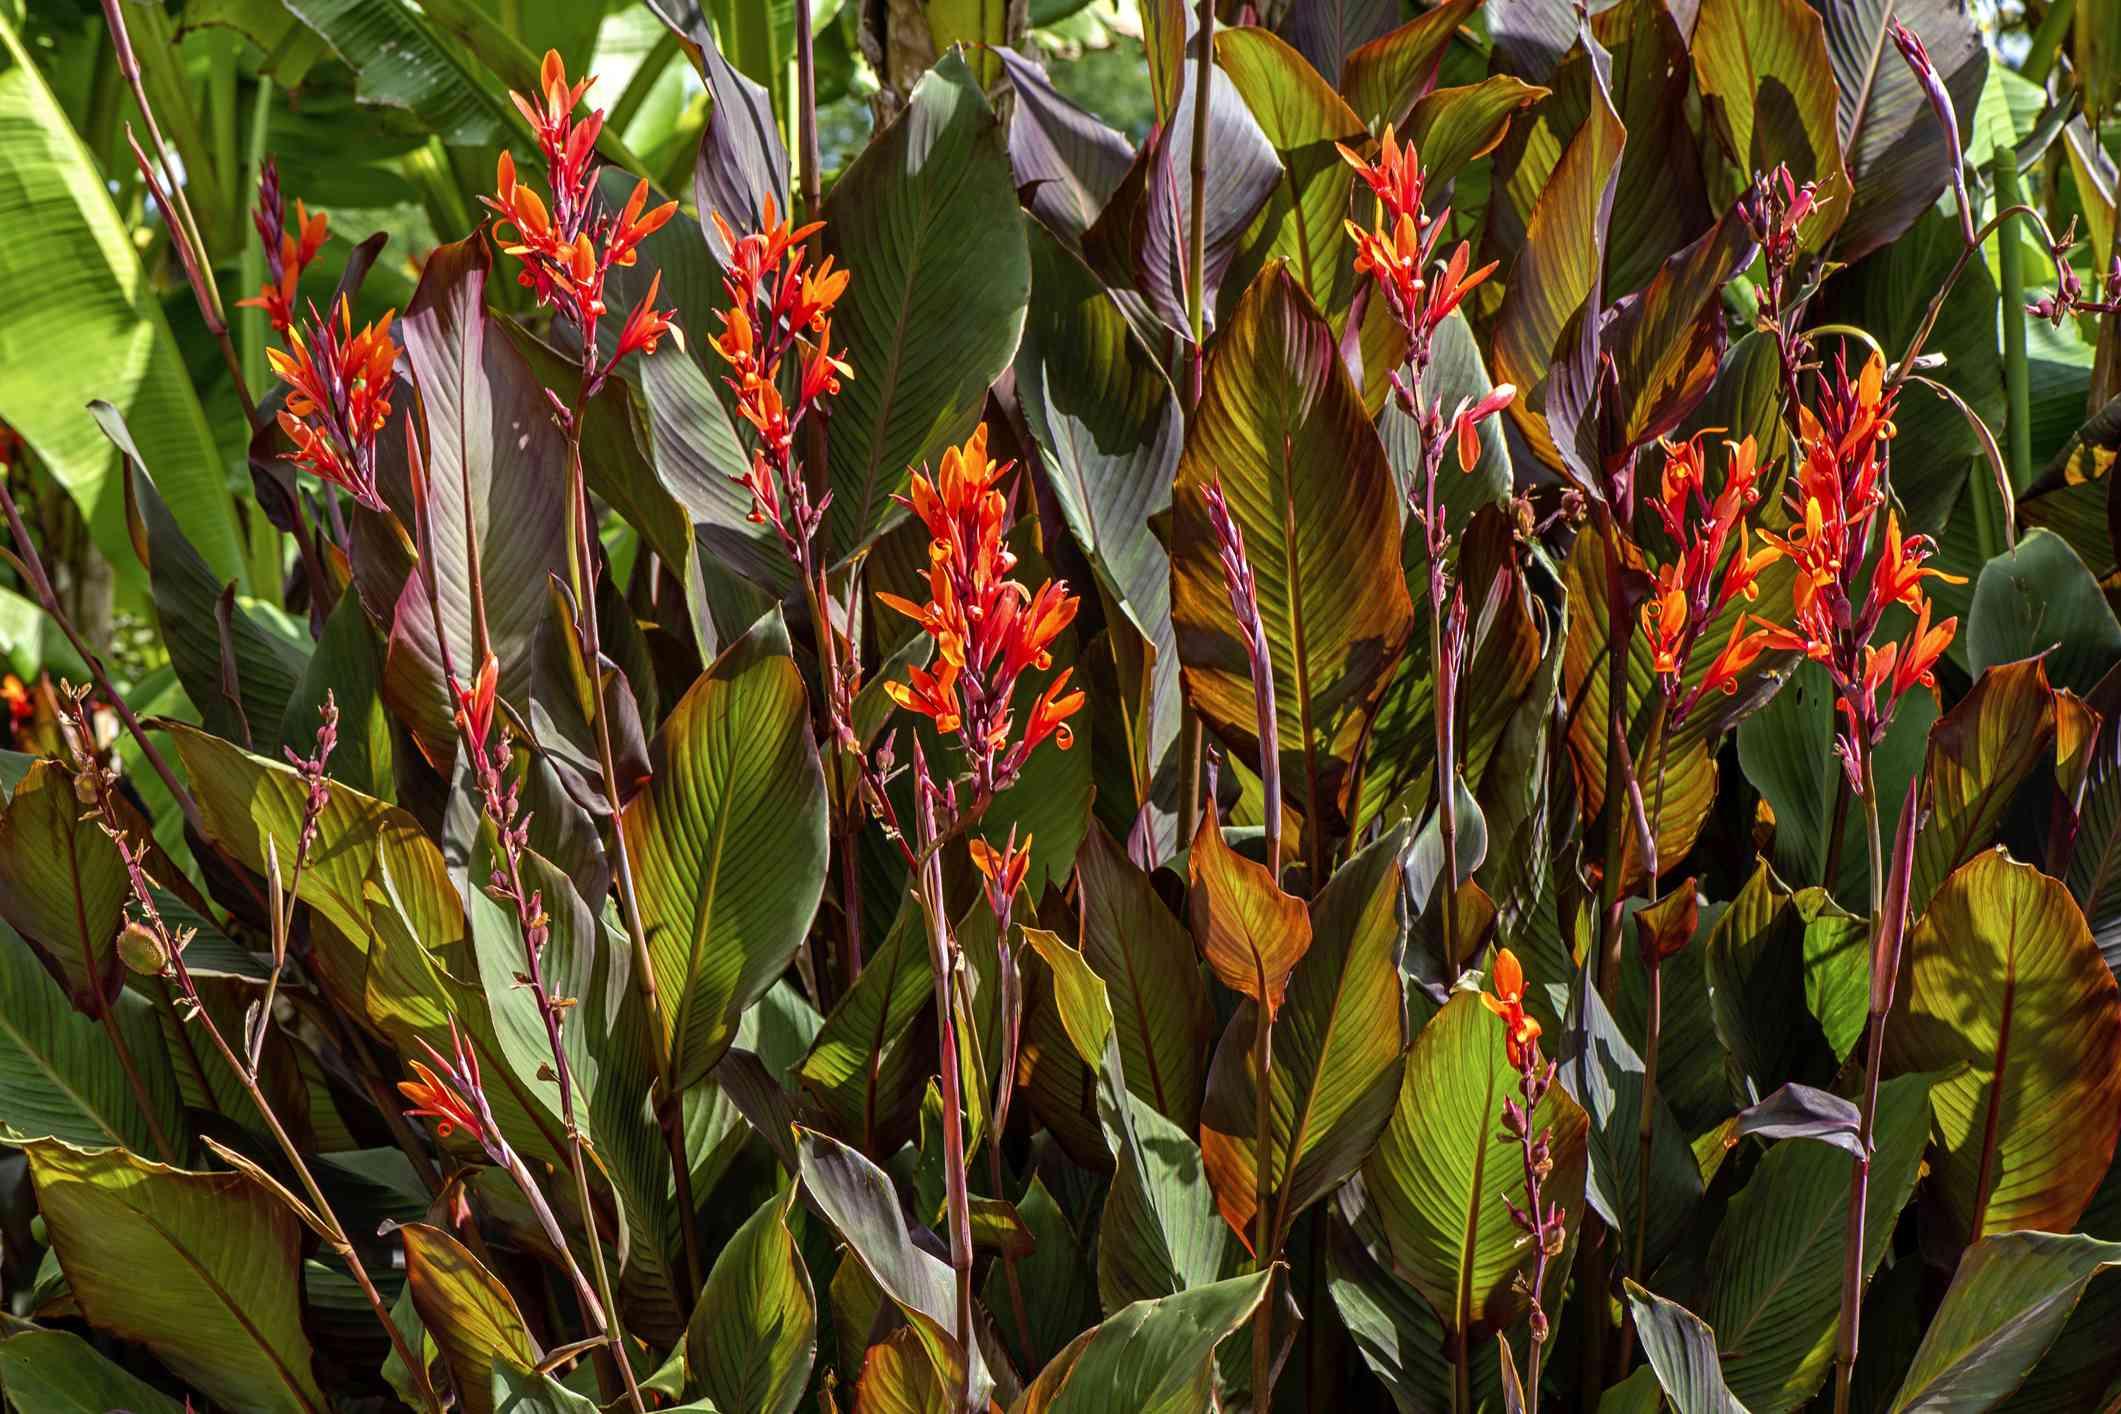 Beautiful vibrant coloured Cannas - Canna Lily orange flowers